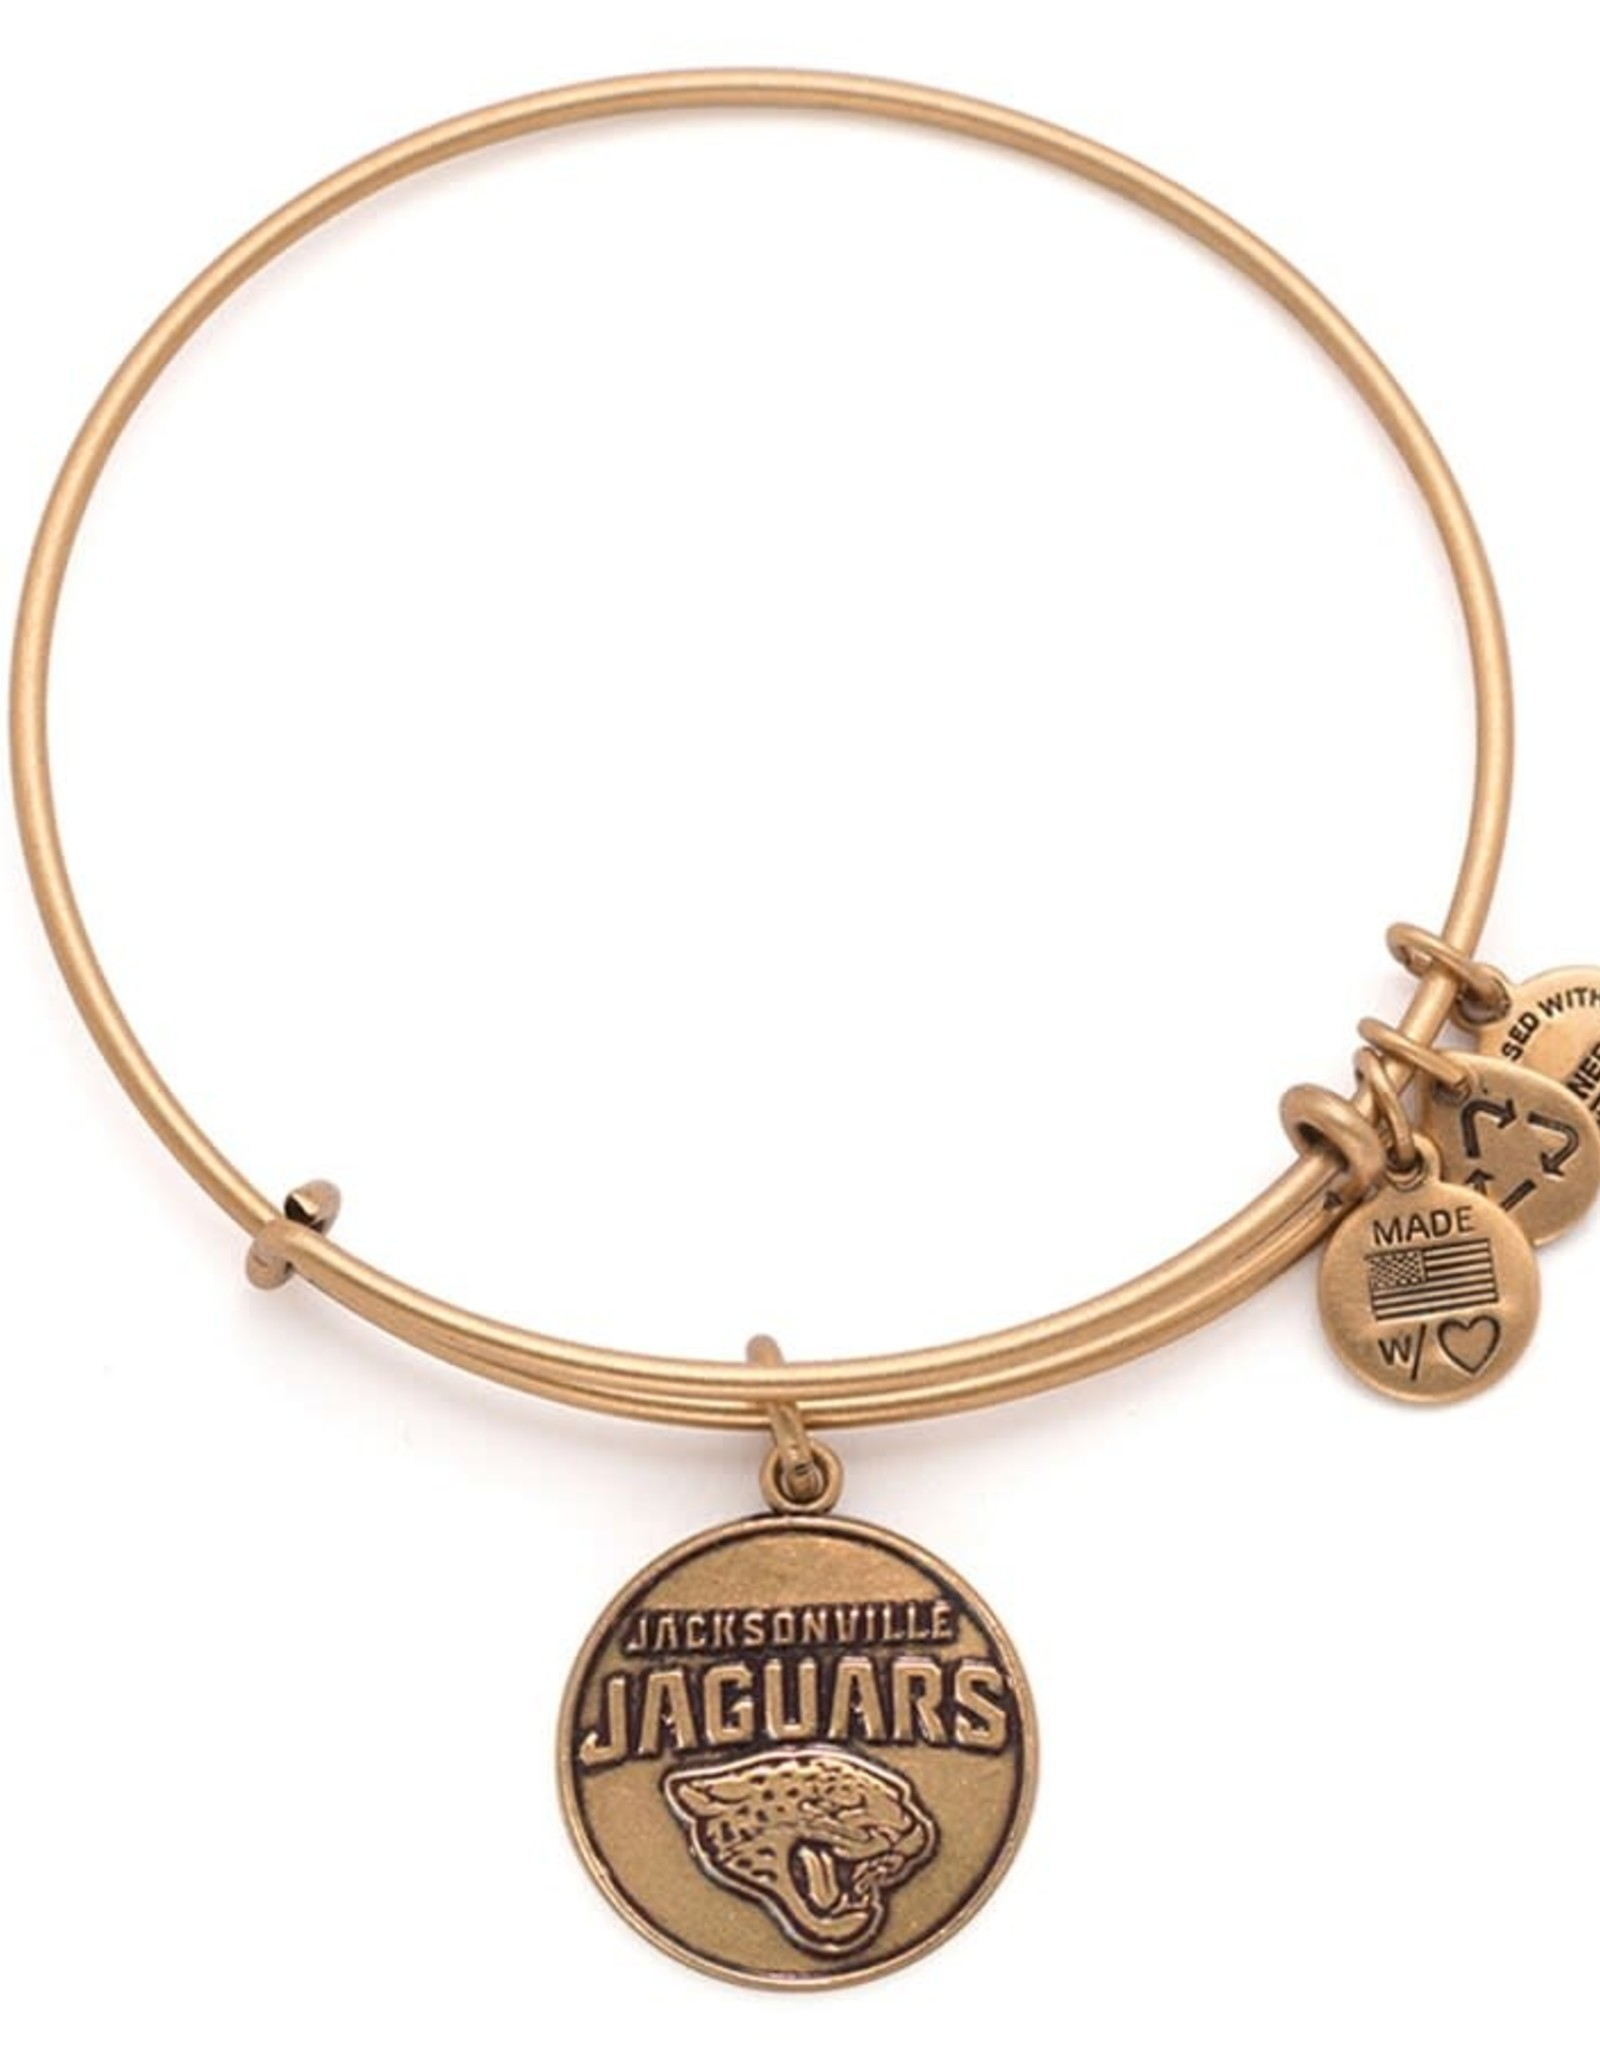 Alex and Ani Alex and Ani, Jacksonville Jaguars logo, RG, FINAL SALE